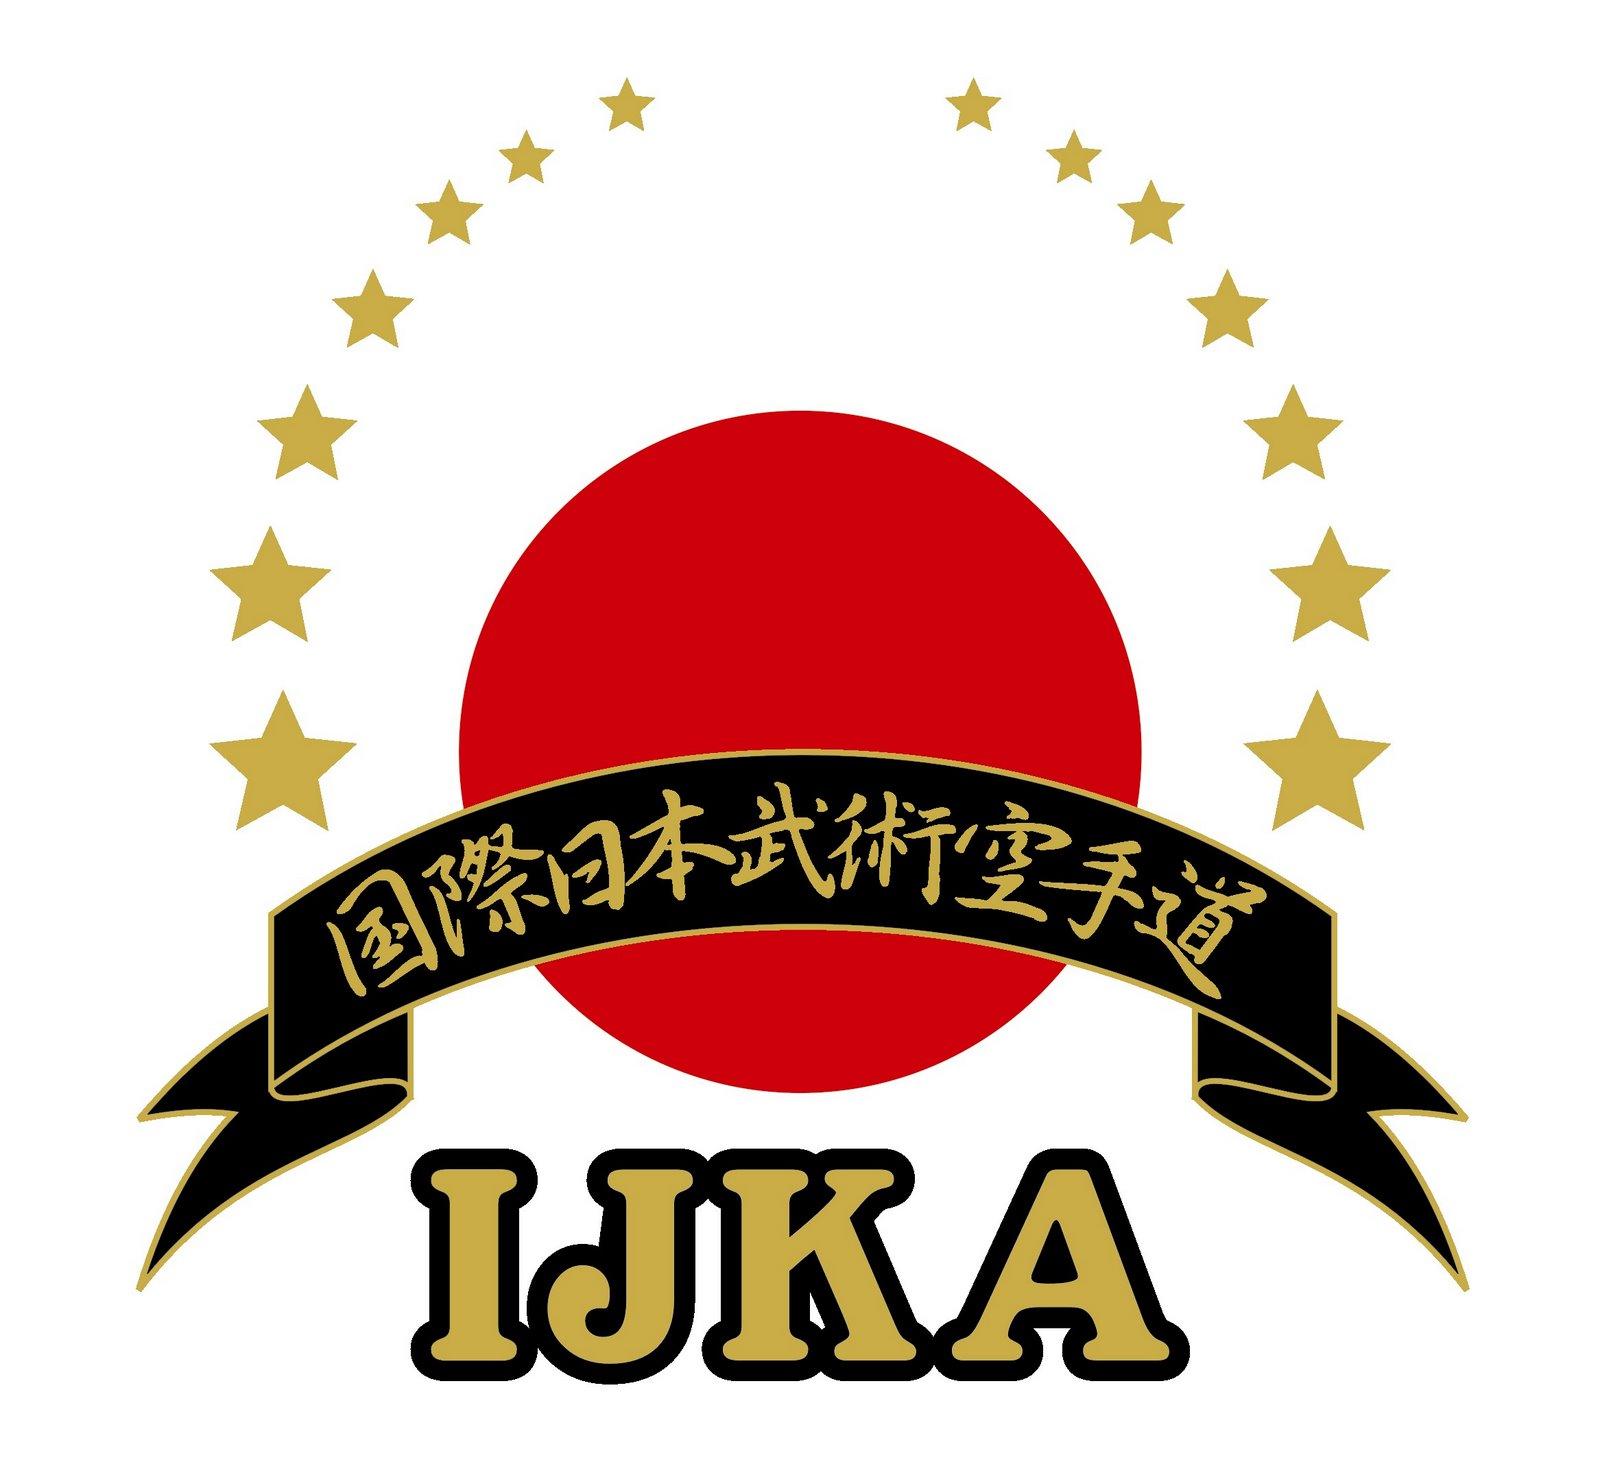 [ijka-logo.jpg]